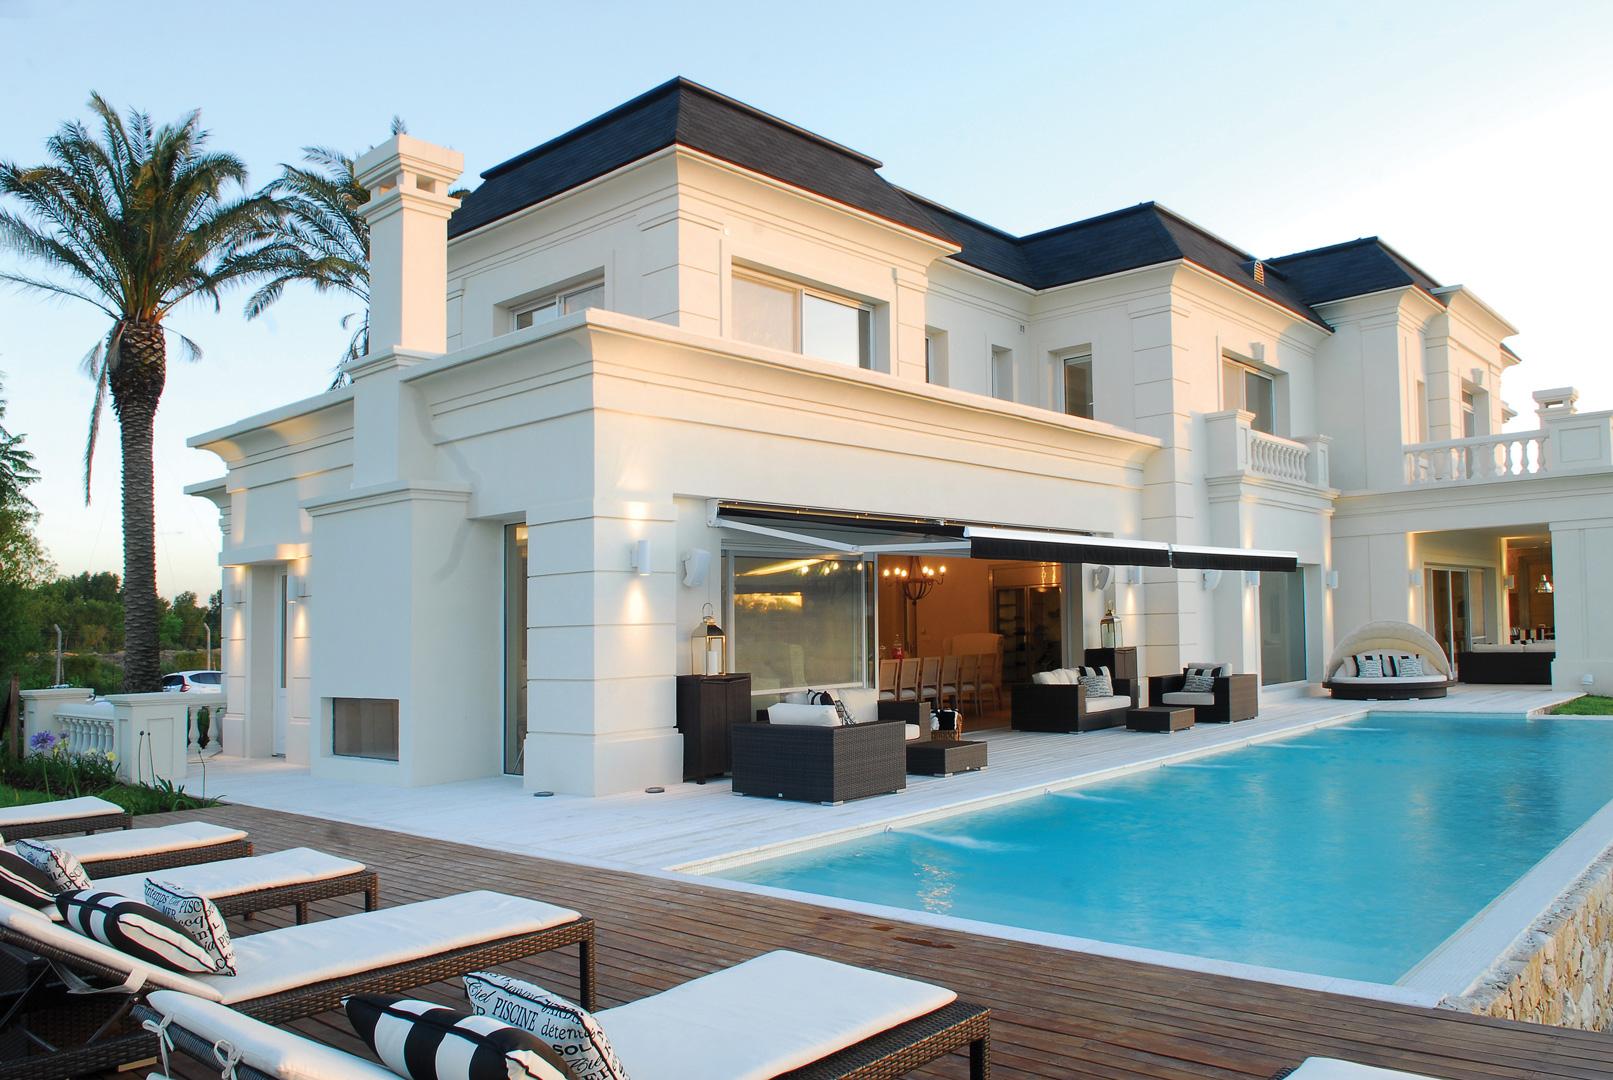 Apa arquitectura casa estilo cl sico franc s for Arquitectura departamentos modernos